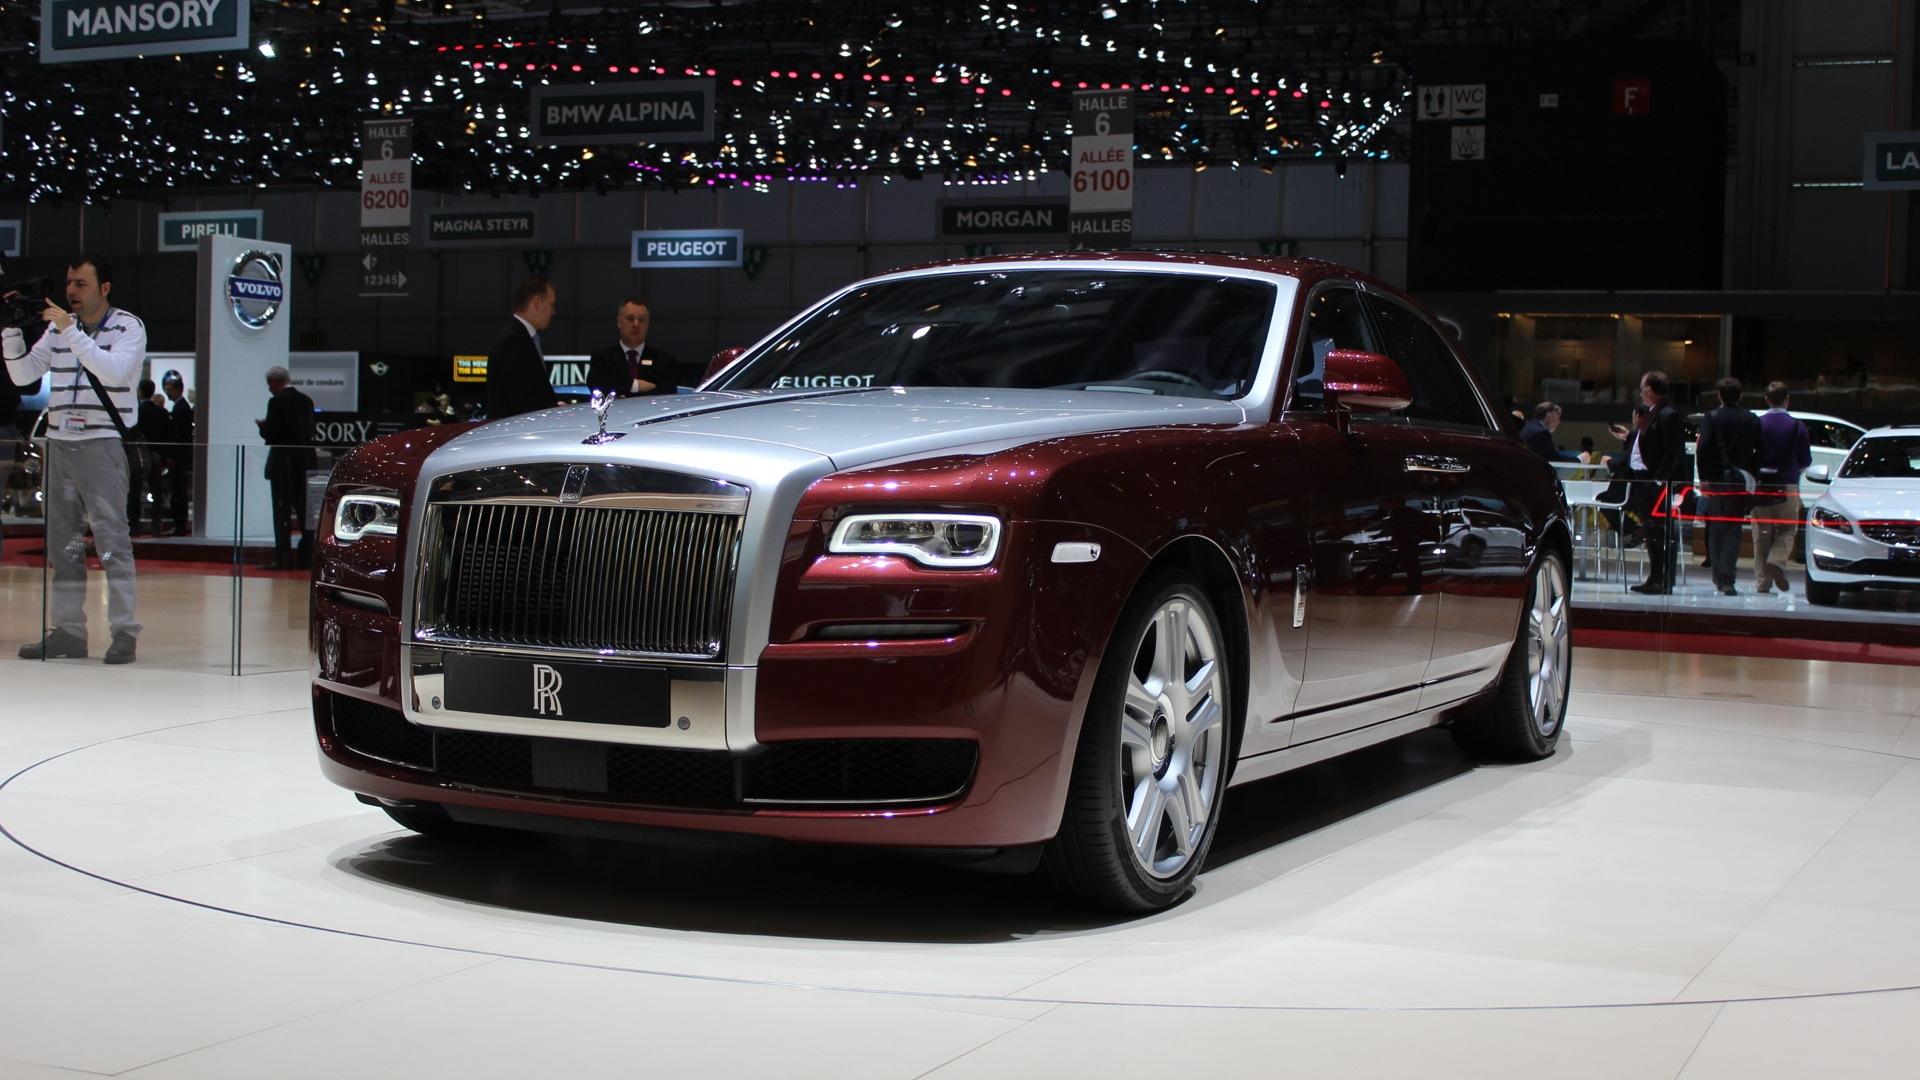 2015 Rolls-Royce Ghost Series II  -  2014 Geneva Auto Show live photos